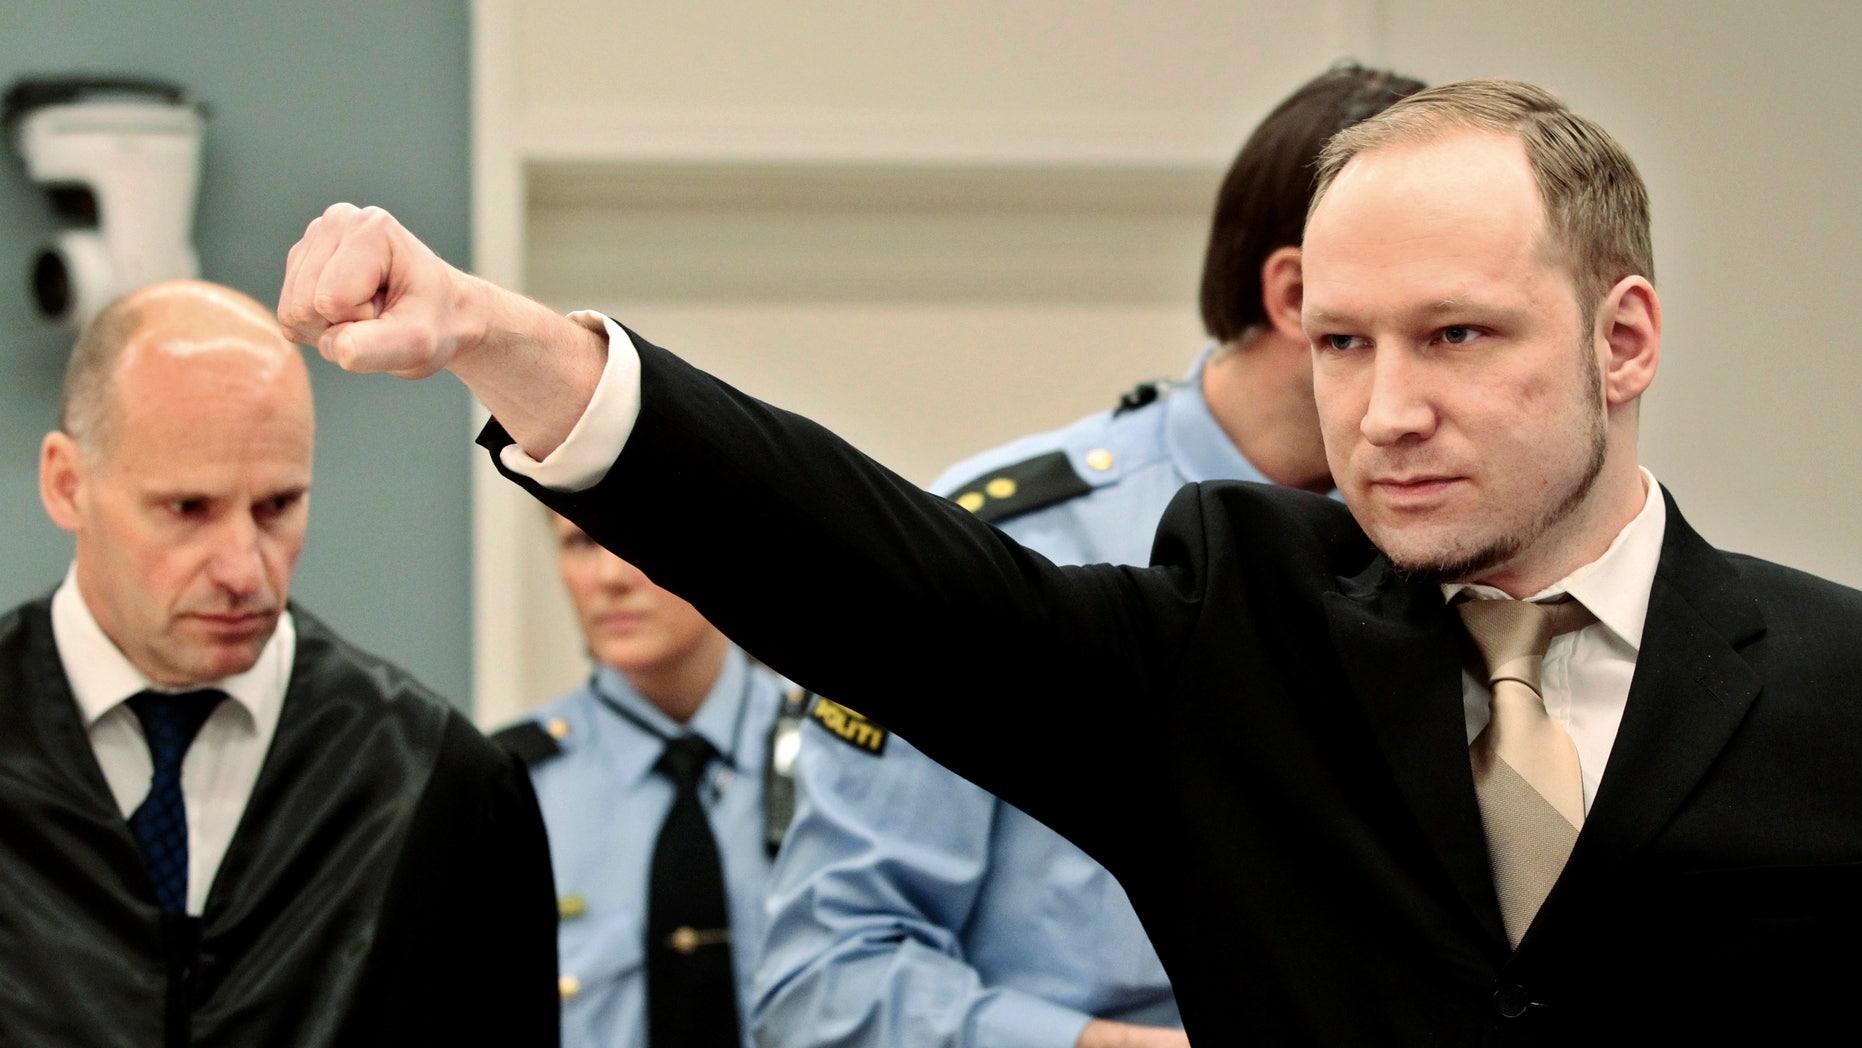 April 16, 2012: File photo of accused Norwegian Anders Behring Breivik as he  gestures as he arrives at the courtroom in Oslo, Norway.